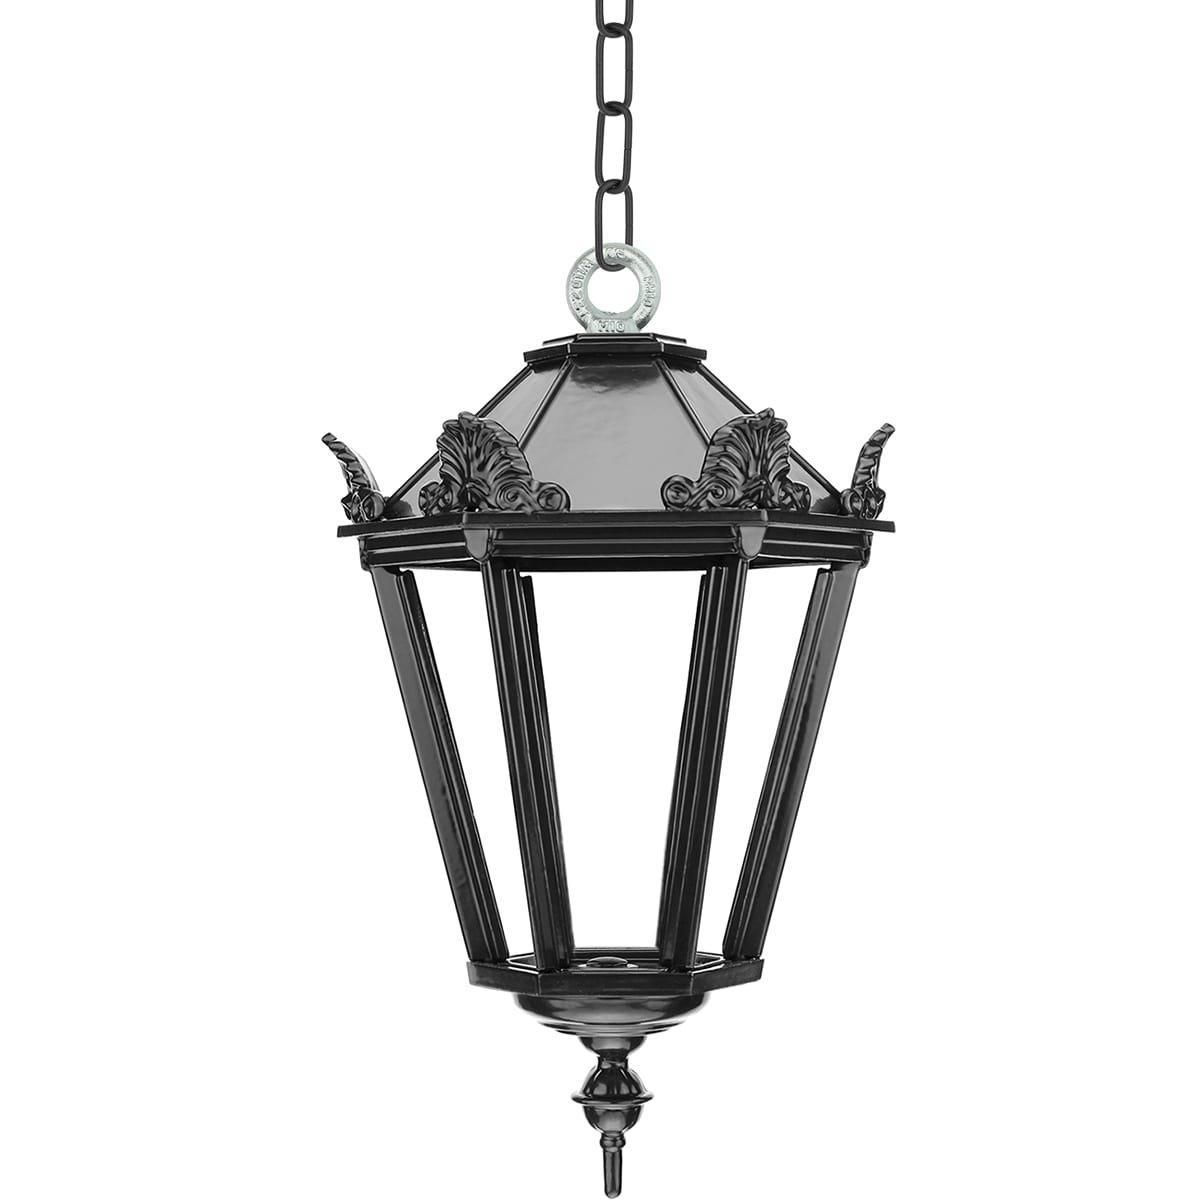 Outdoor lighting Classic Rural Porch lamp Sliedrecht on chain S - 40 cm